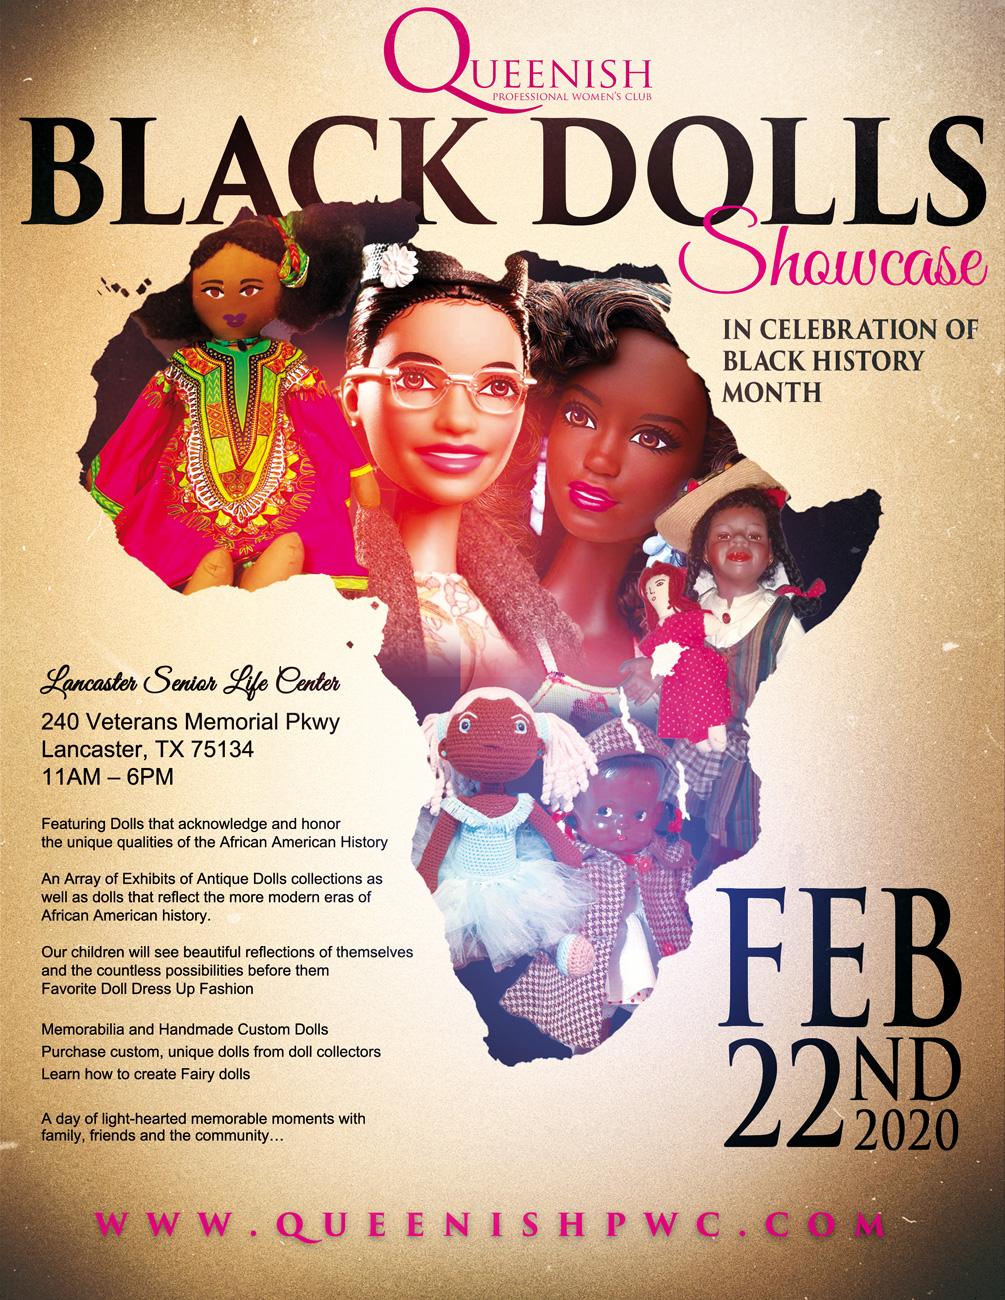 Queenish Black Dolls Dallas: February 22, 2020